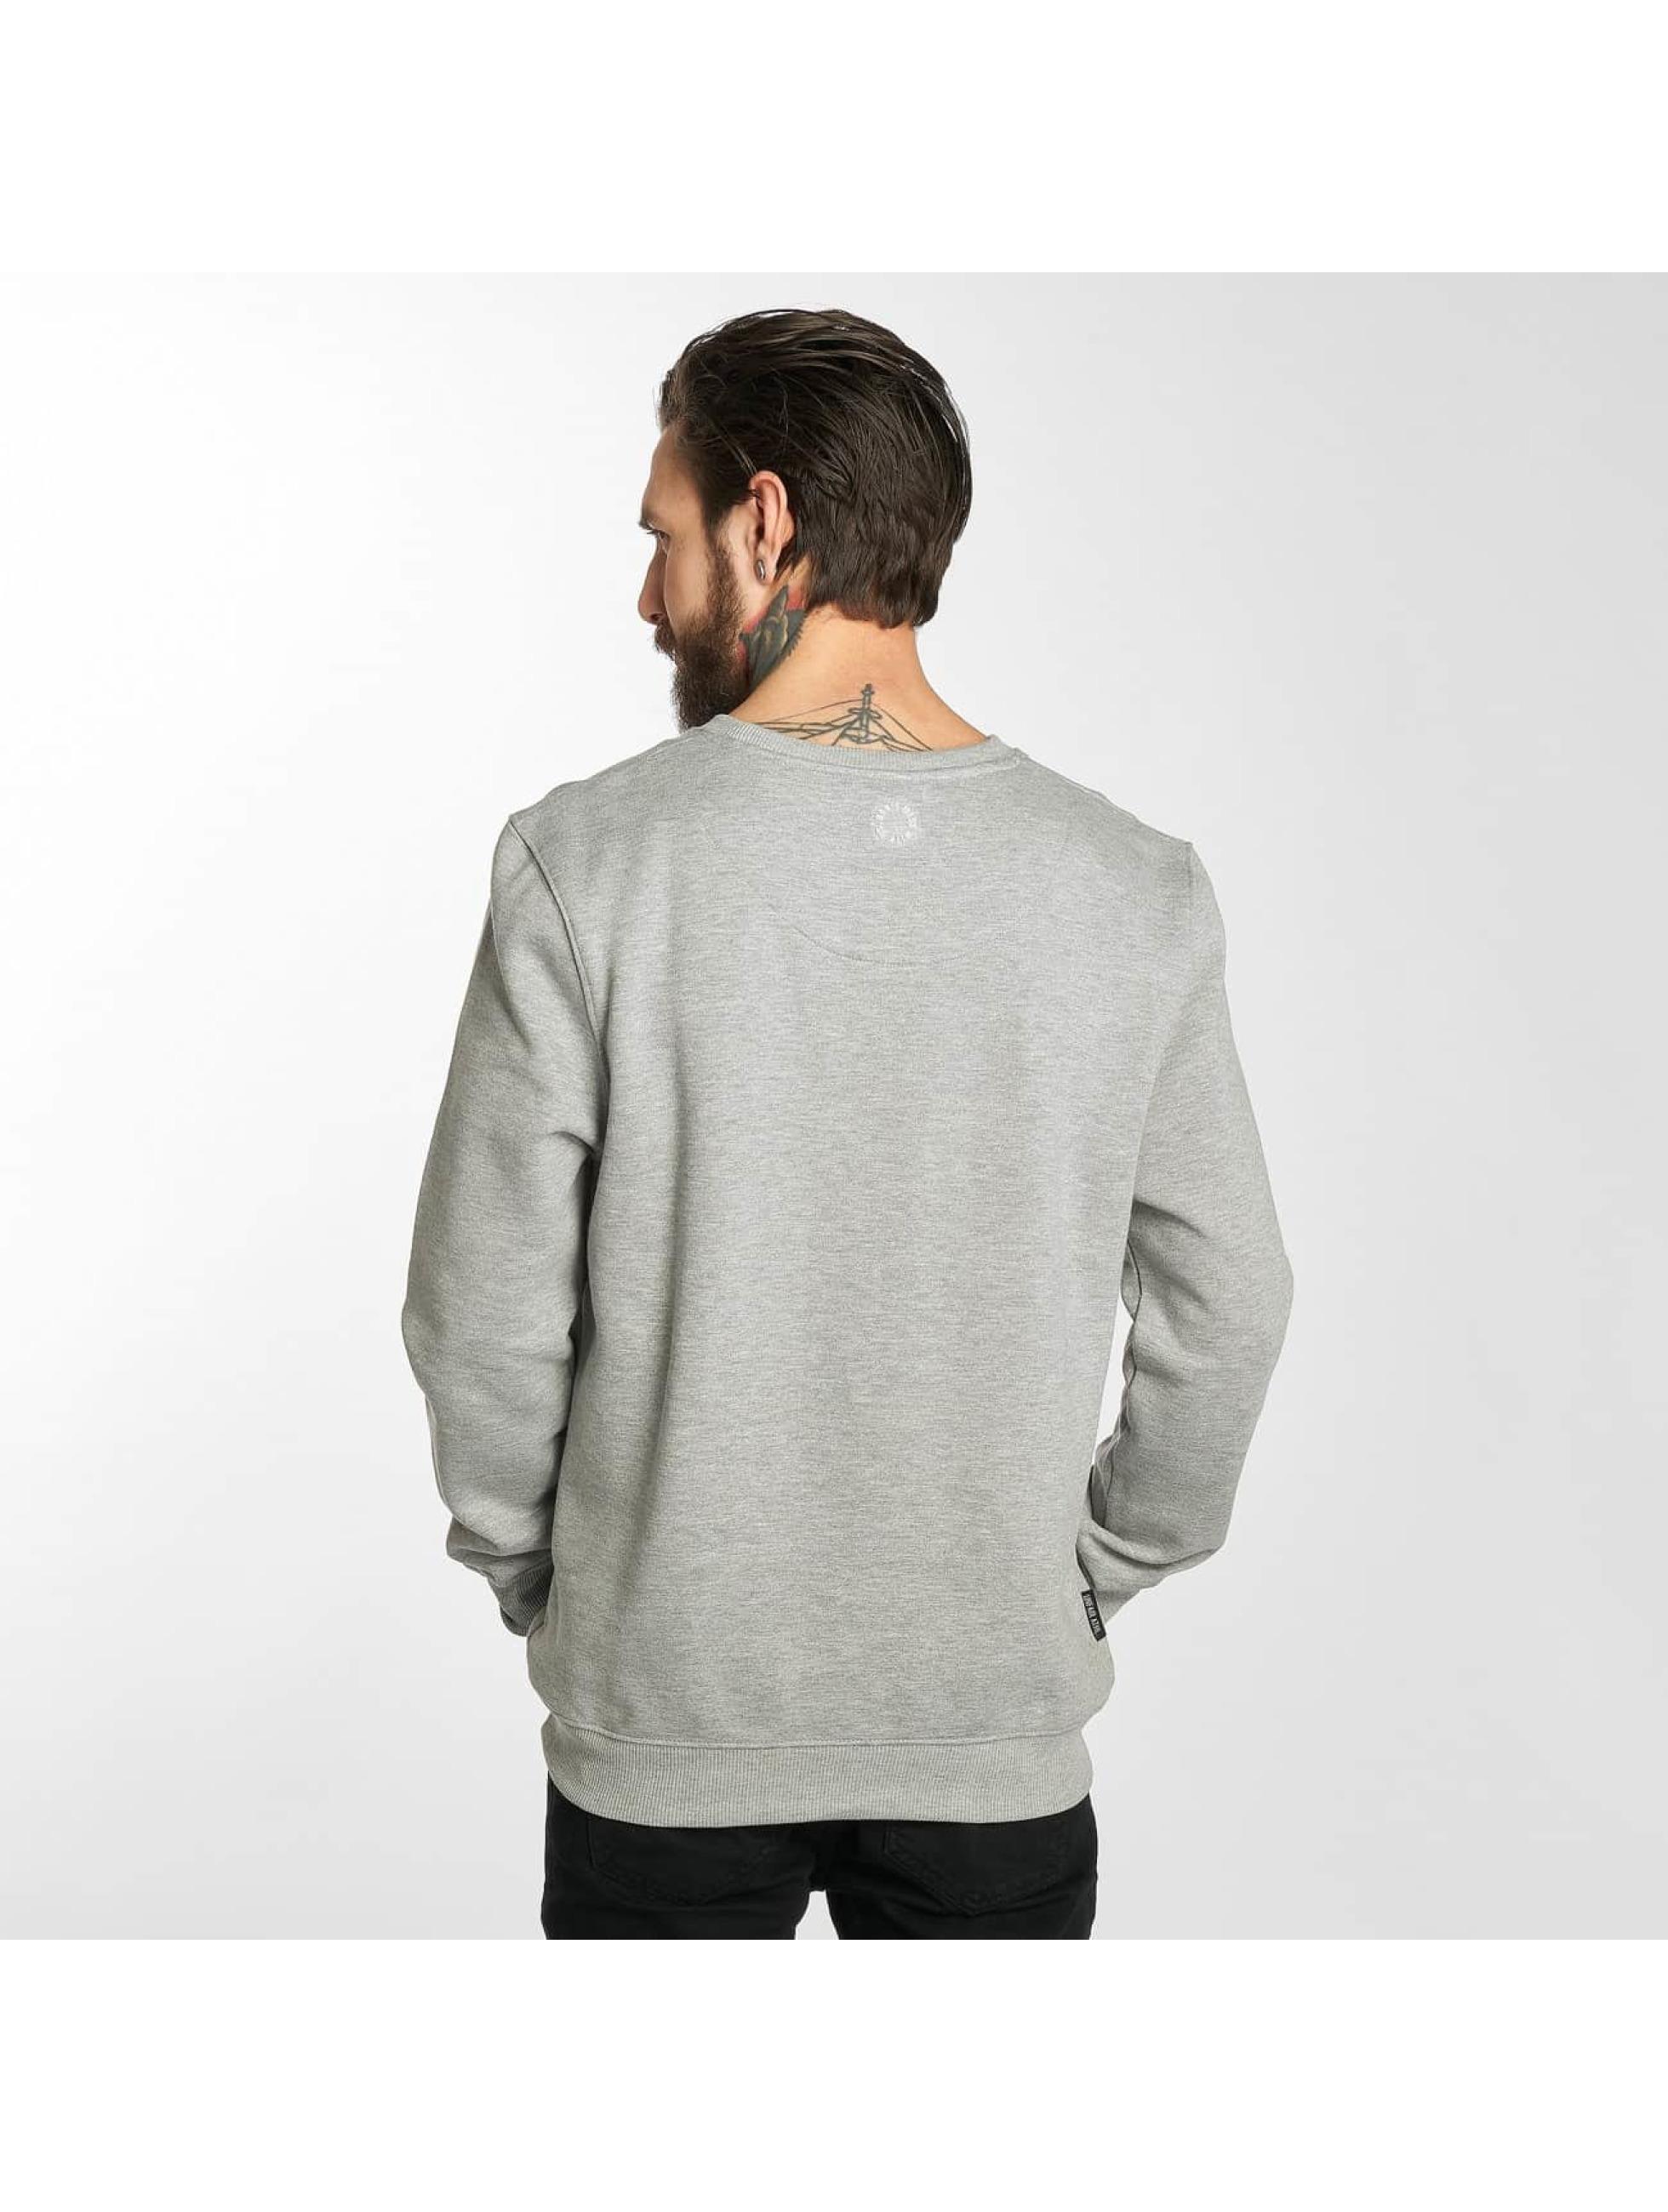 UNFAIR ATHLETICS Пуловер Classic серый